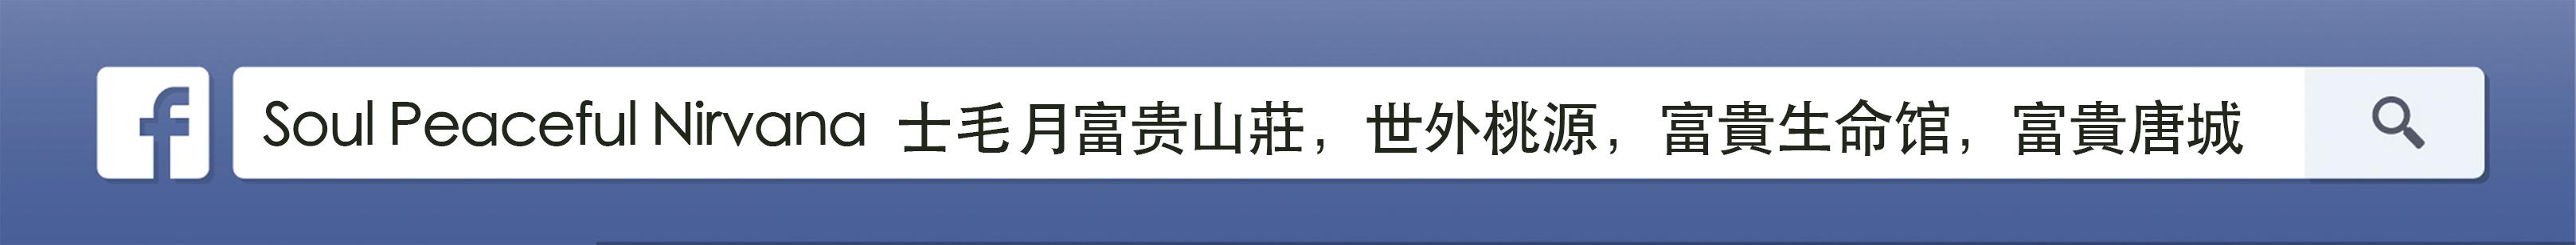 NV_FB.jpg